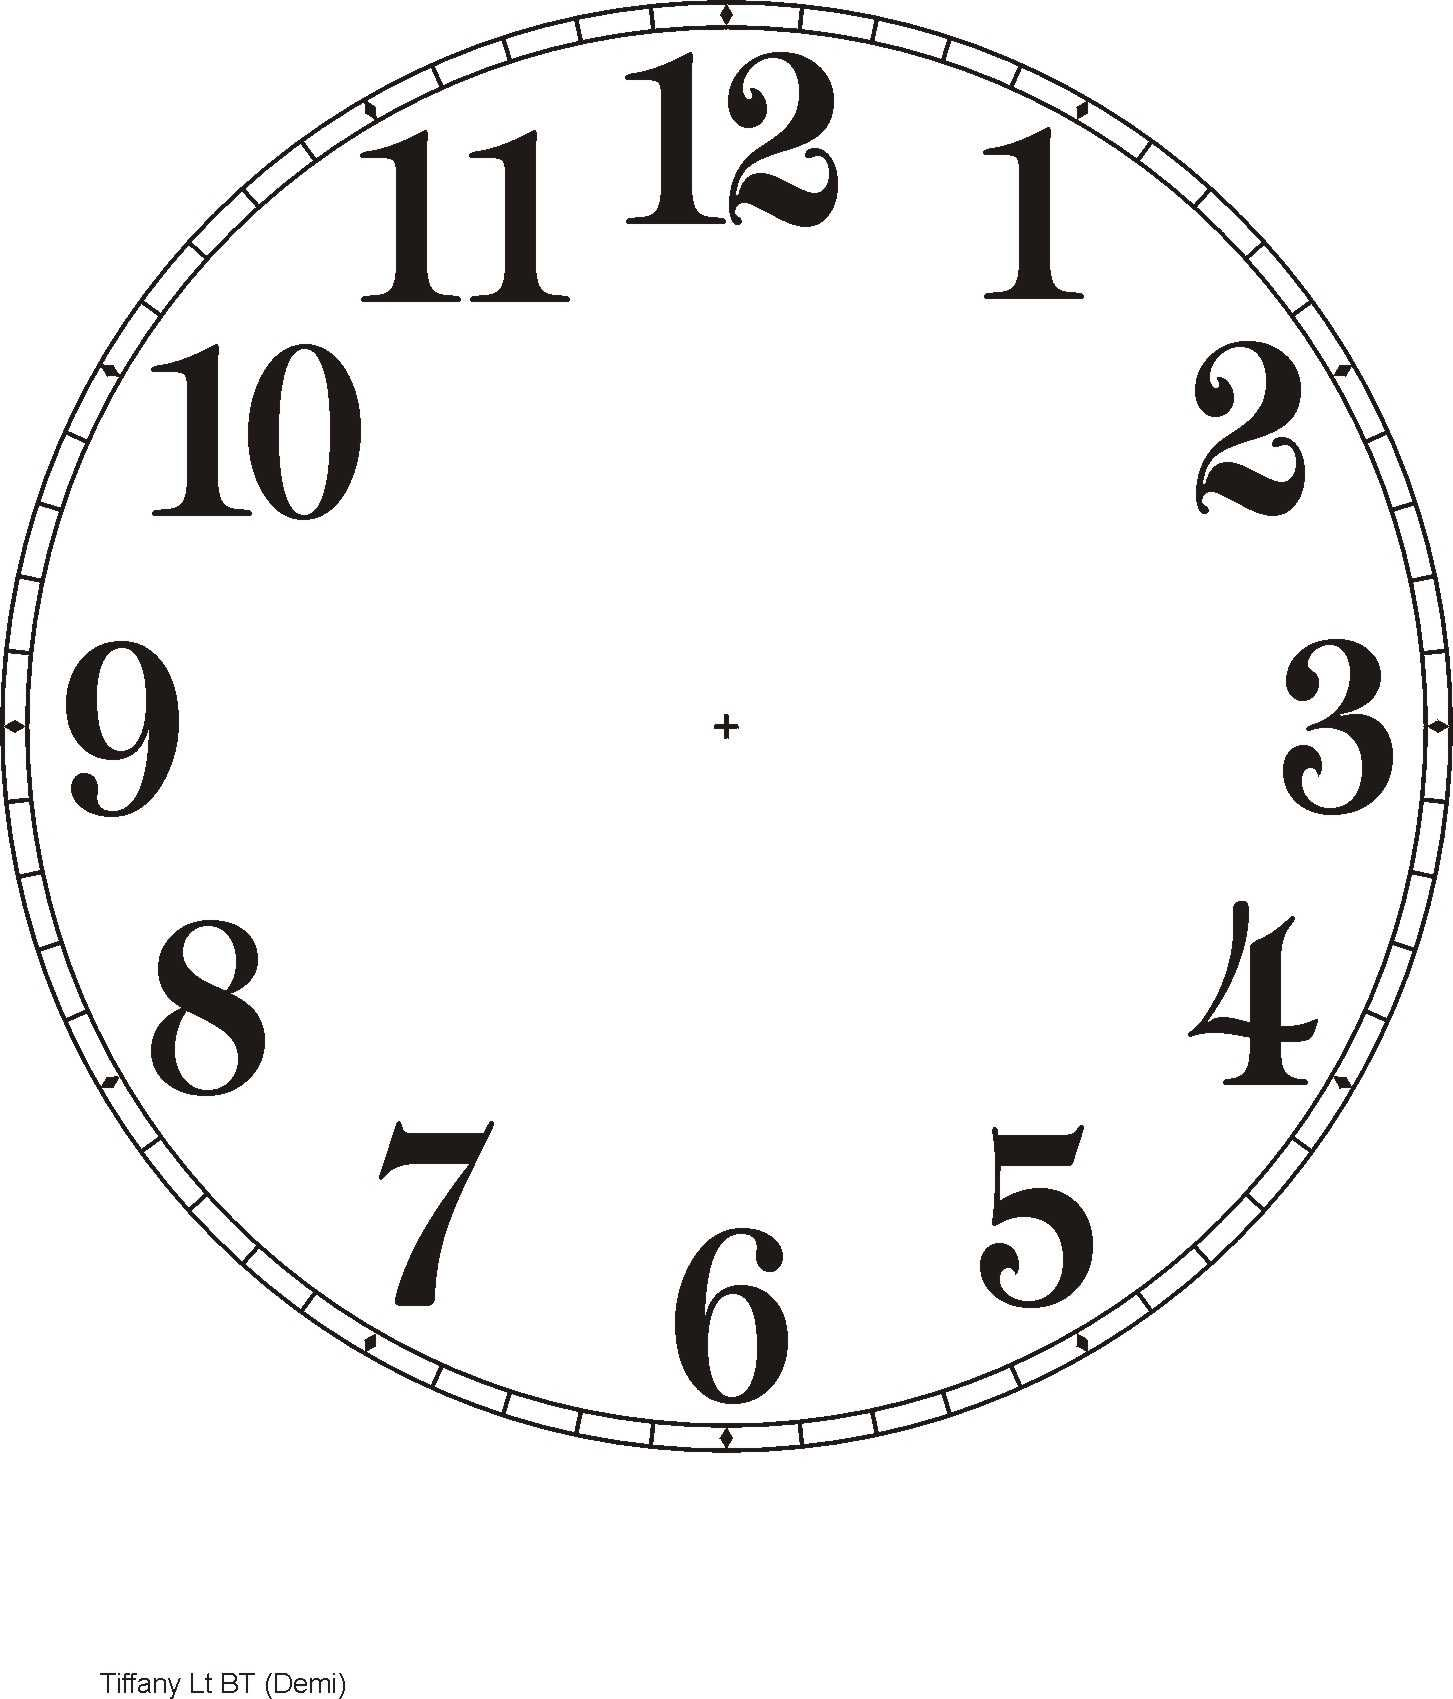 Marvellous Clock Face Printable Clock Face Printable Clock Faces furniture Fancy Clock Faces